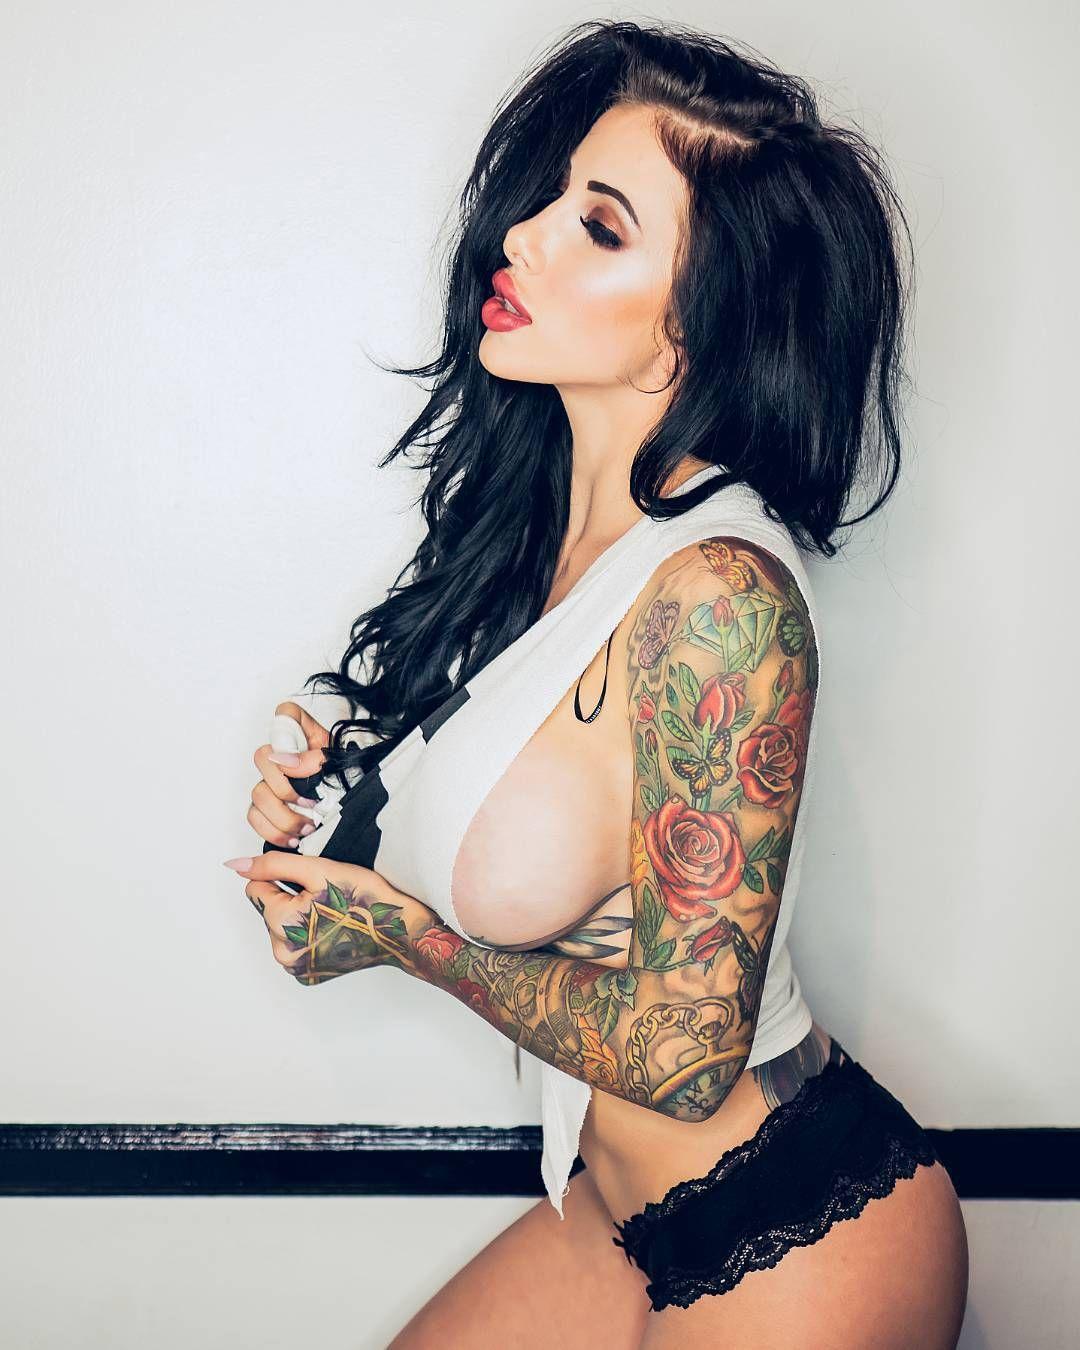 Bad girl татуировки